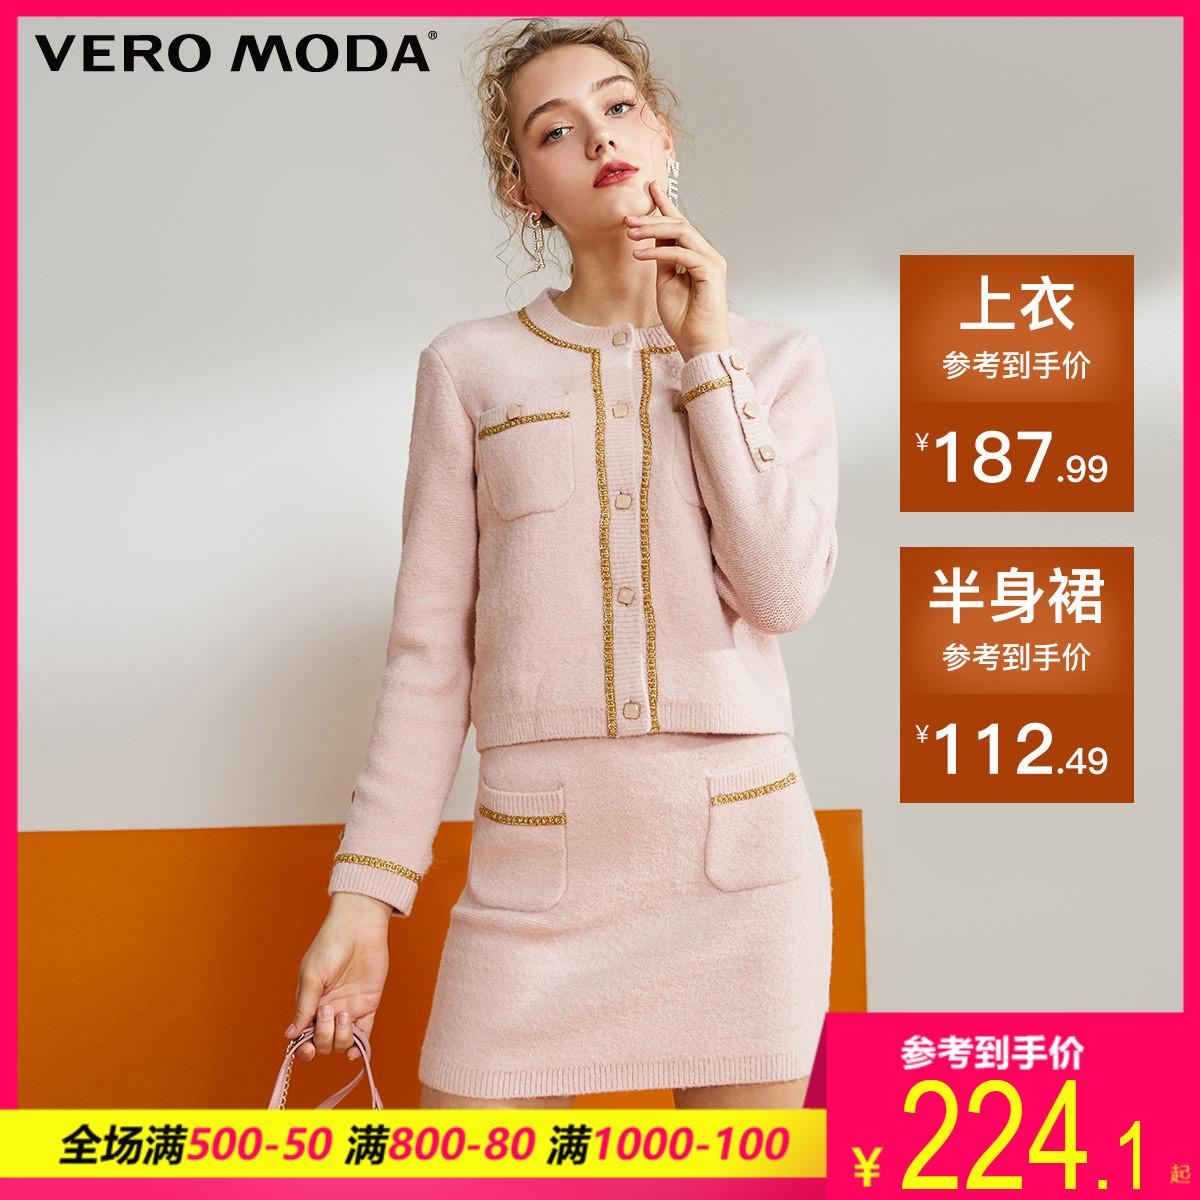 Vero Moda2019秋冬新款小香风针织套装女 319313576